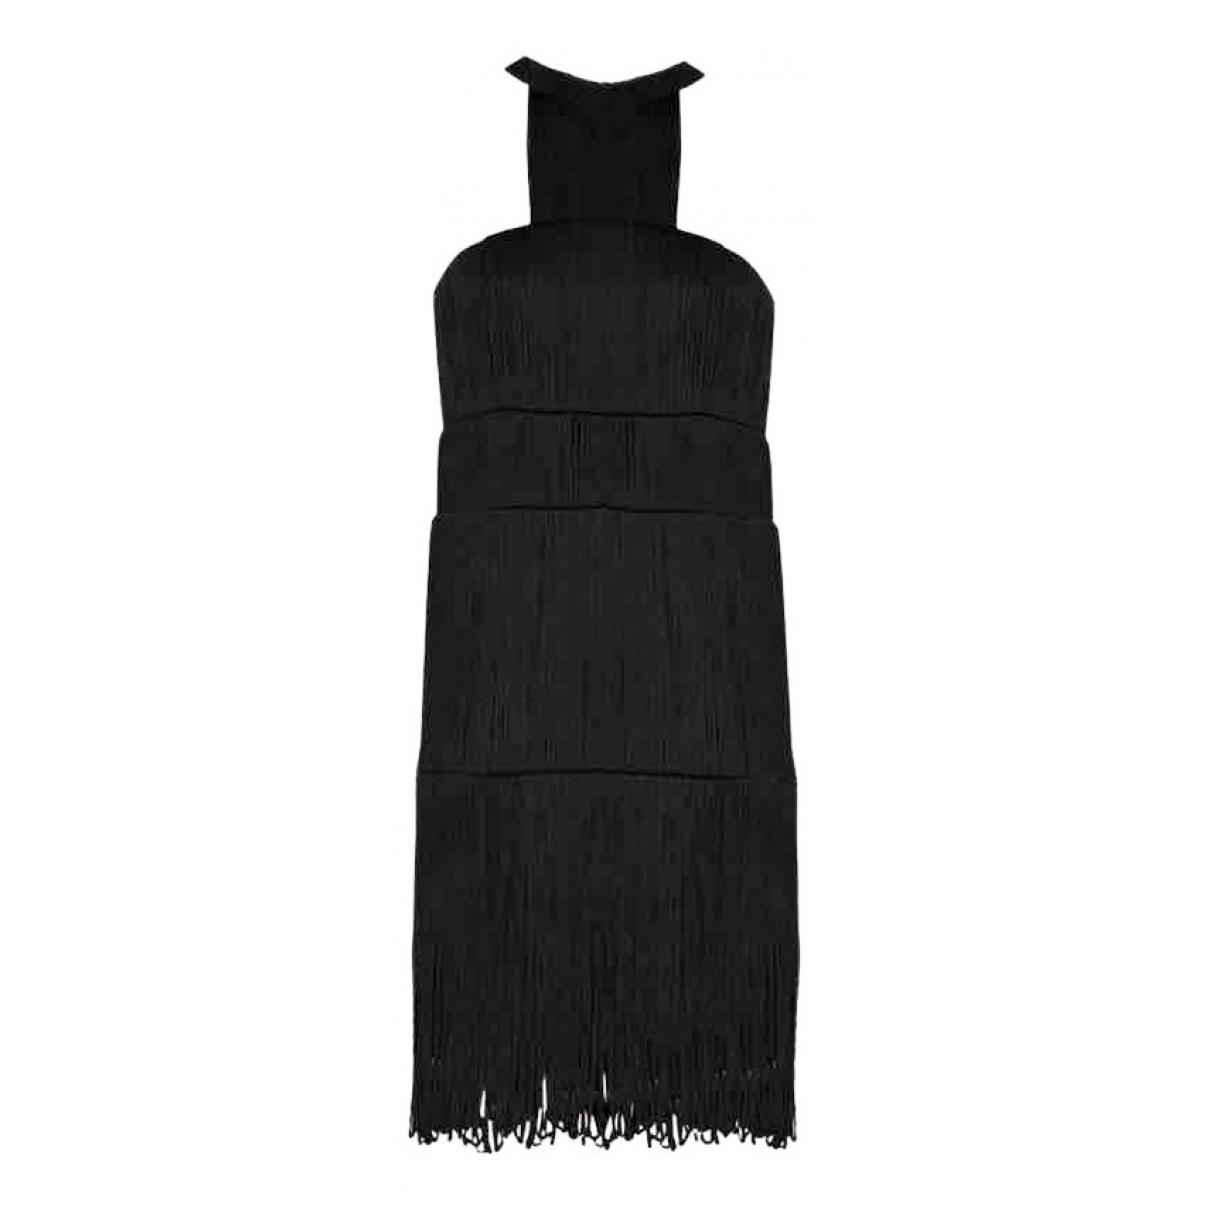 Hoss Intropia \N Kleid in  Schwarz Polyester